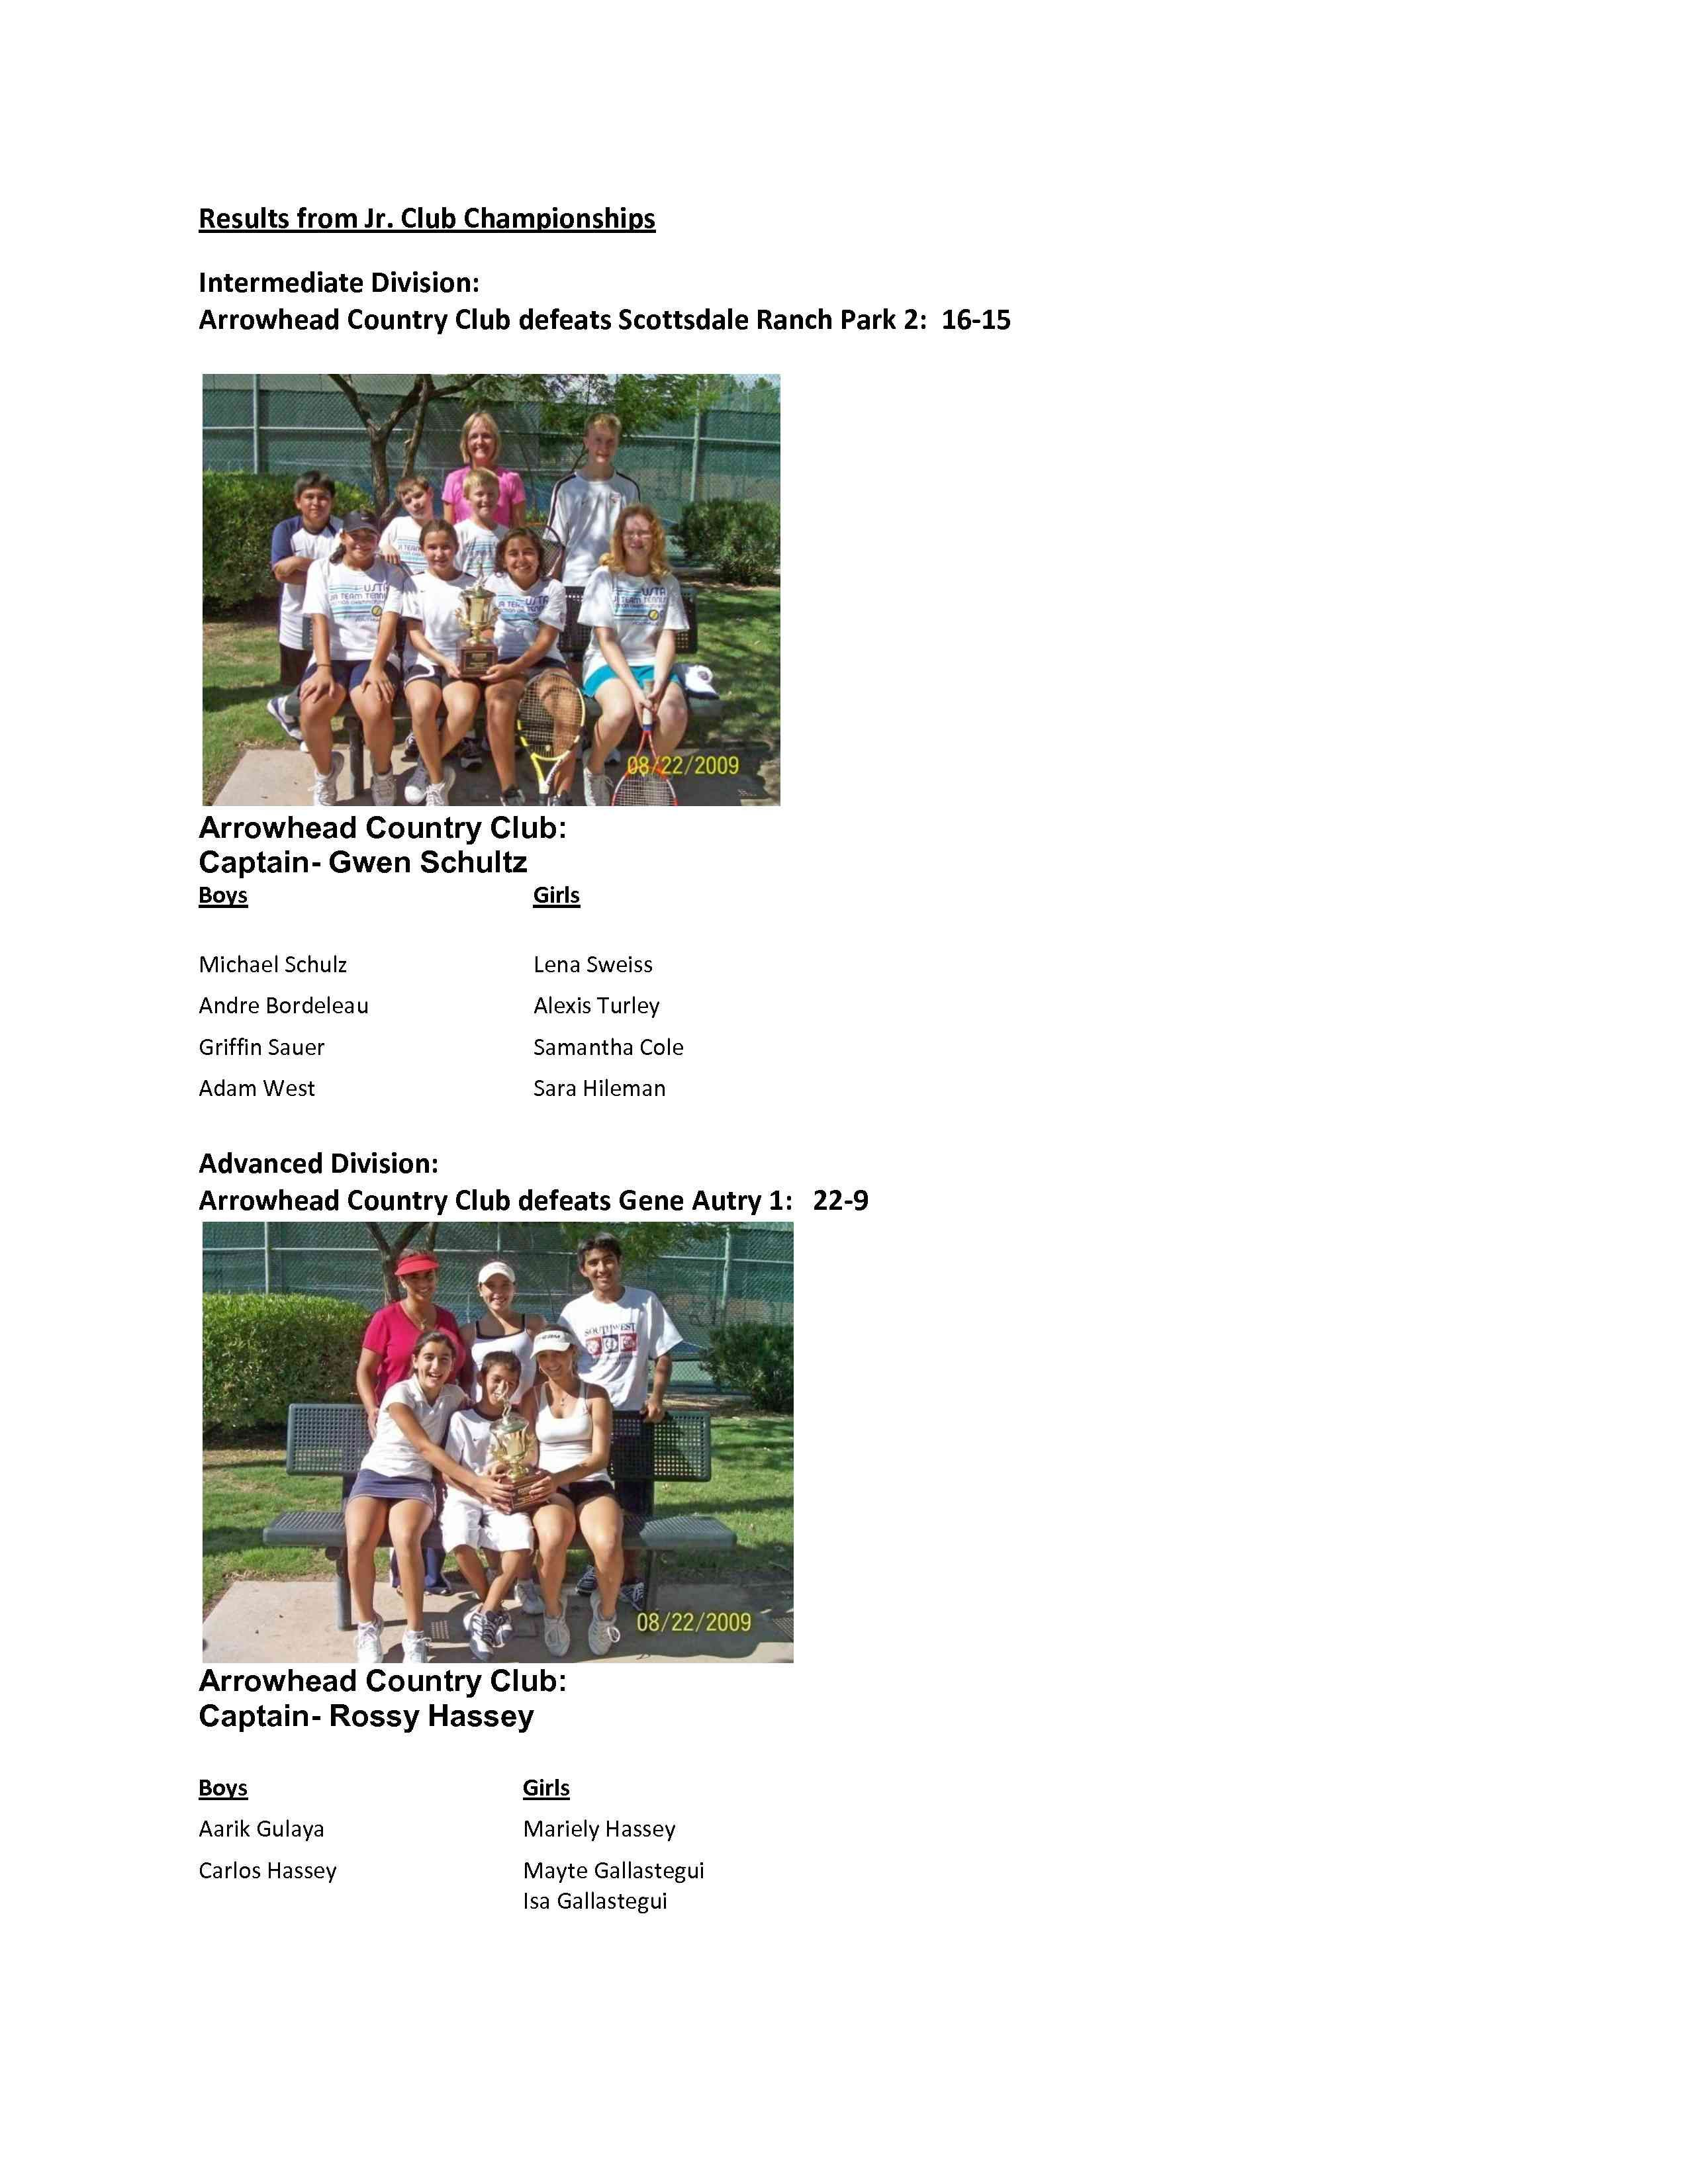 Jr. Club Championships Page 2